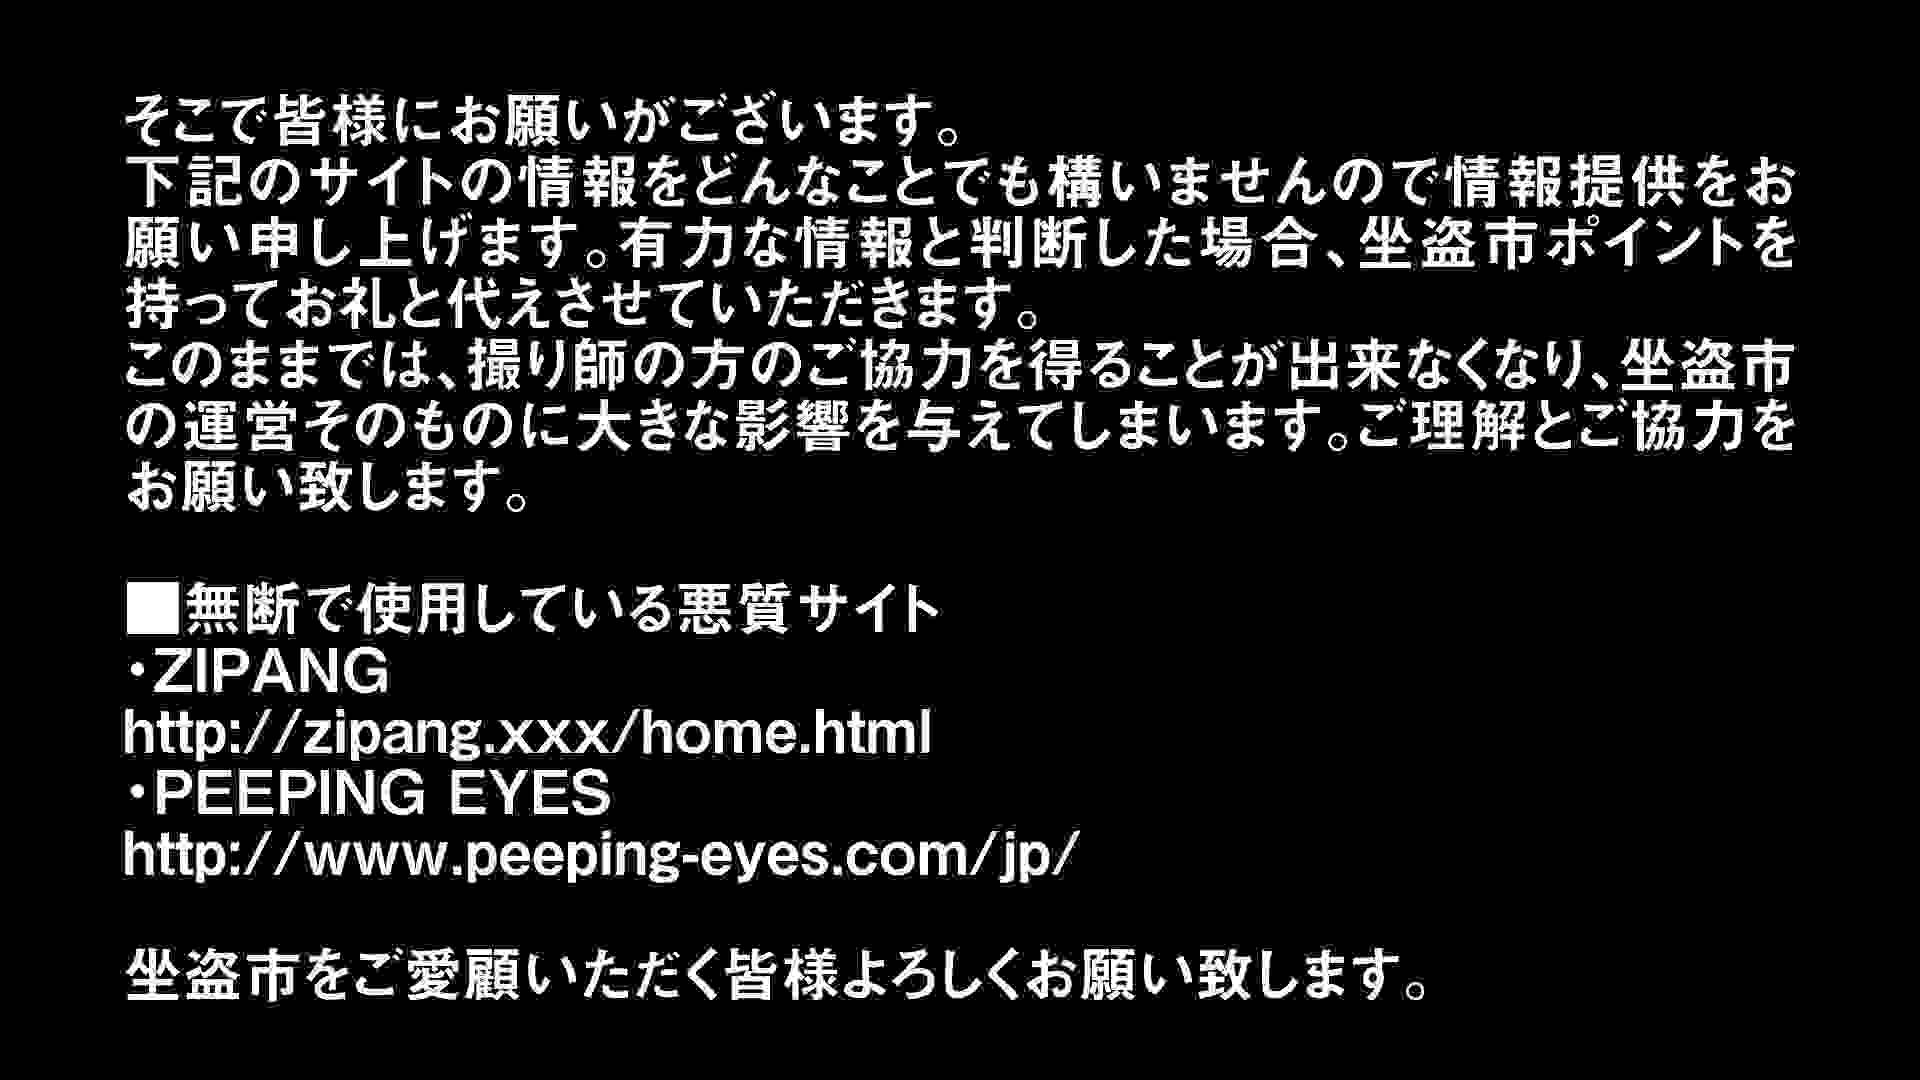 Aquaな露天風呂Vol.296 盗撮シリーズ   露天風呂編  102PIX 41